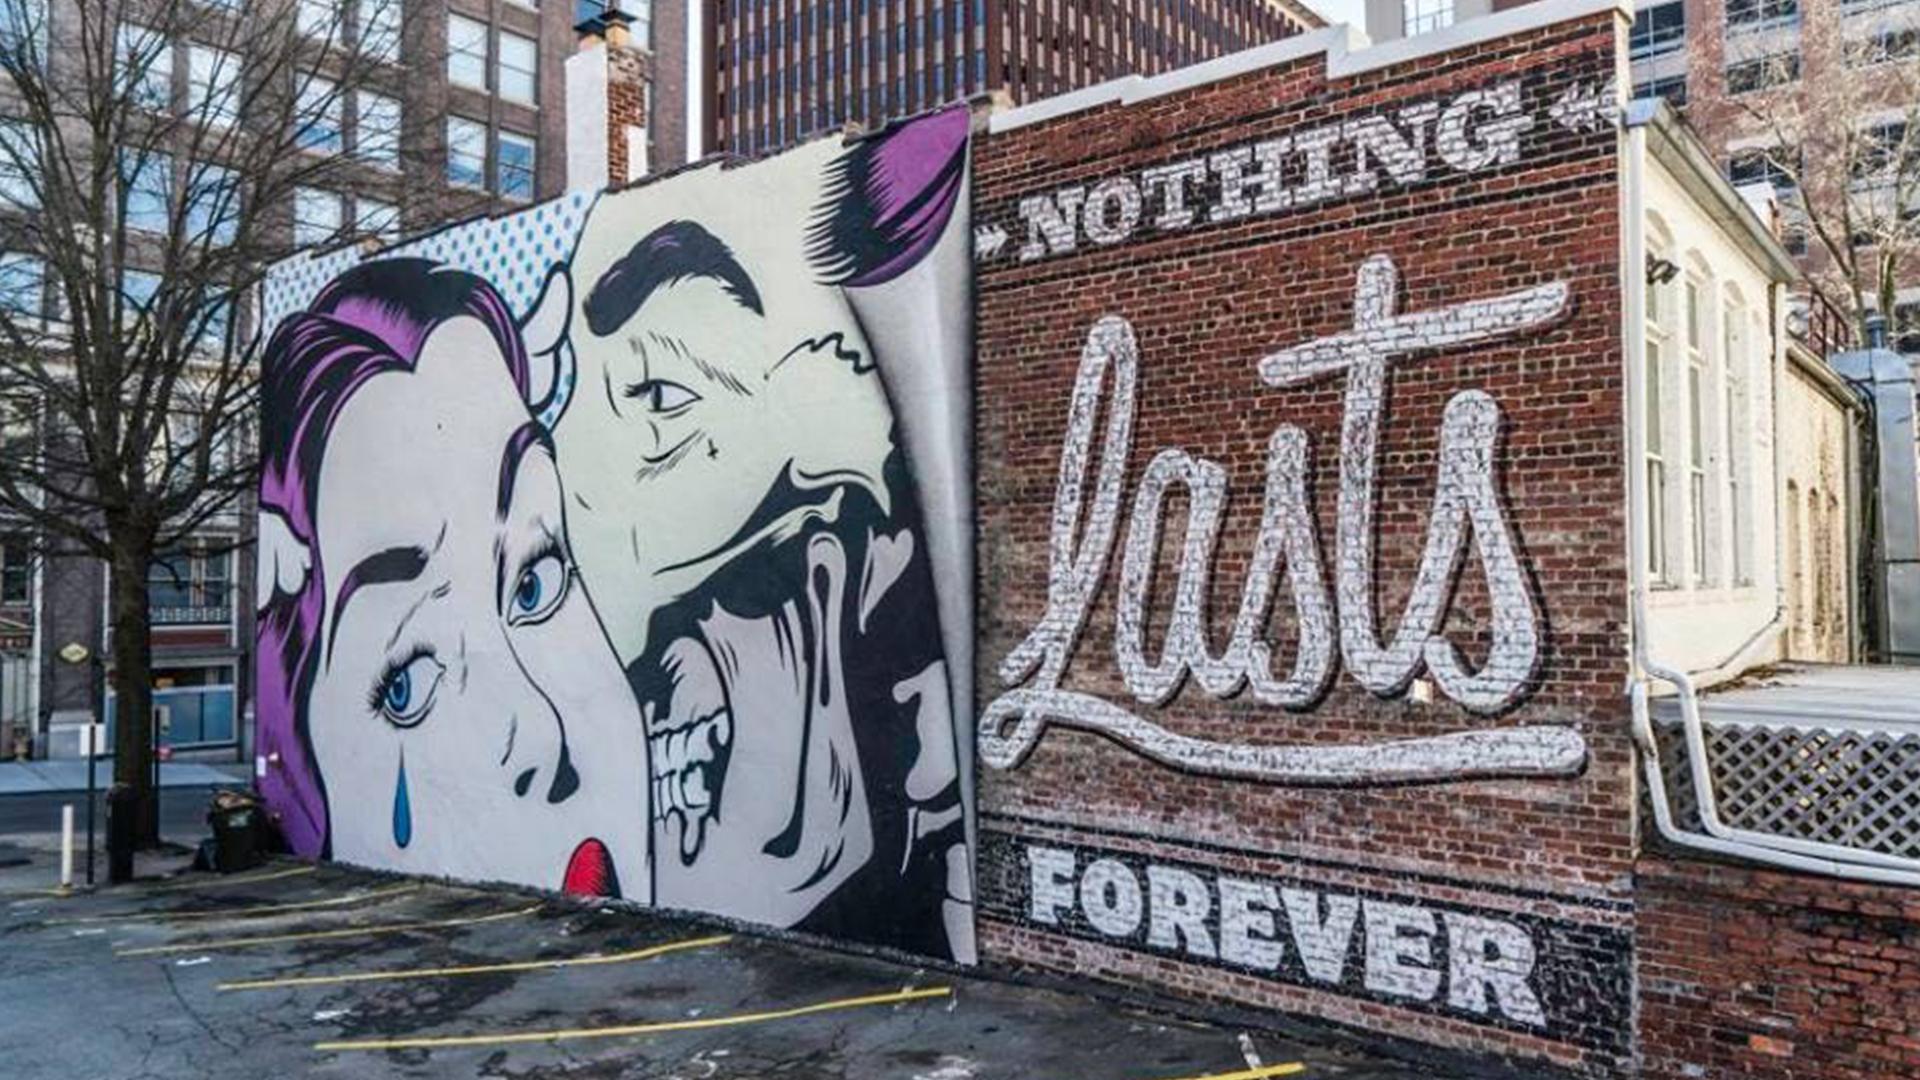 Street Art - Nothing Lasts Forever